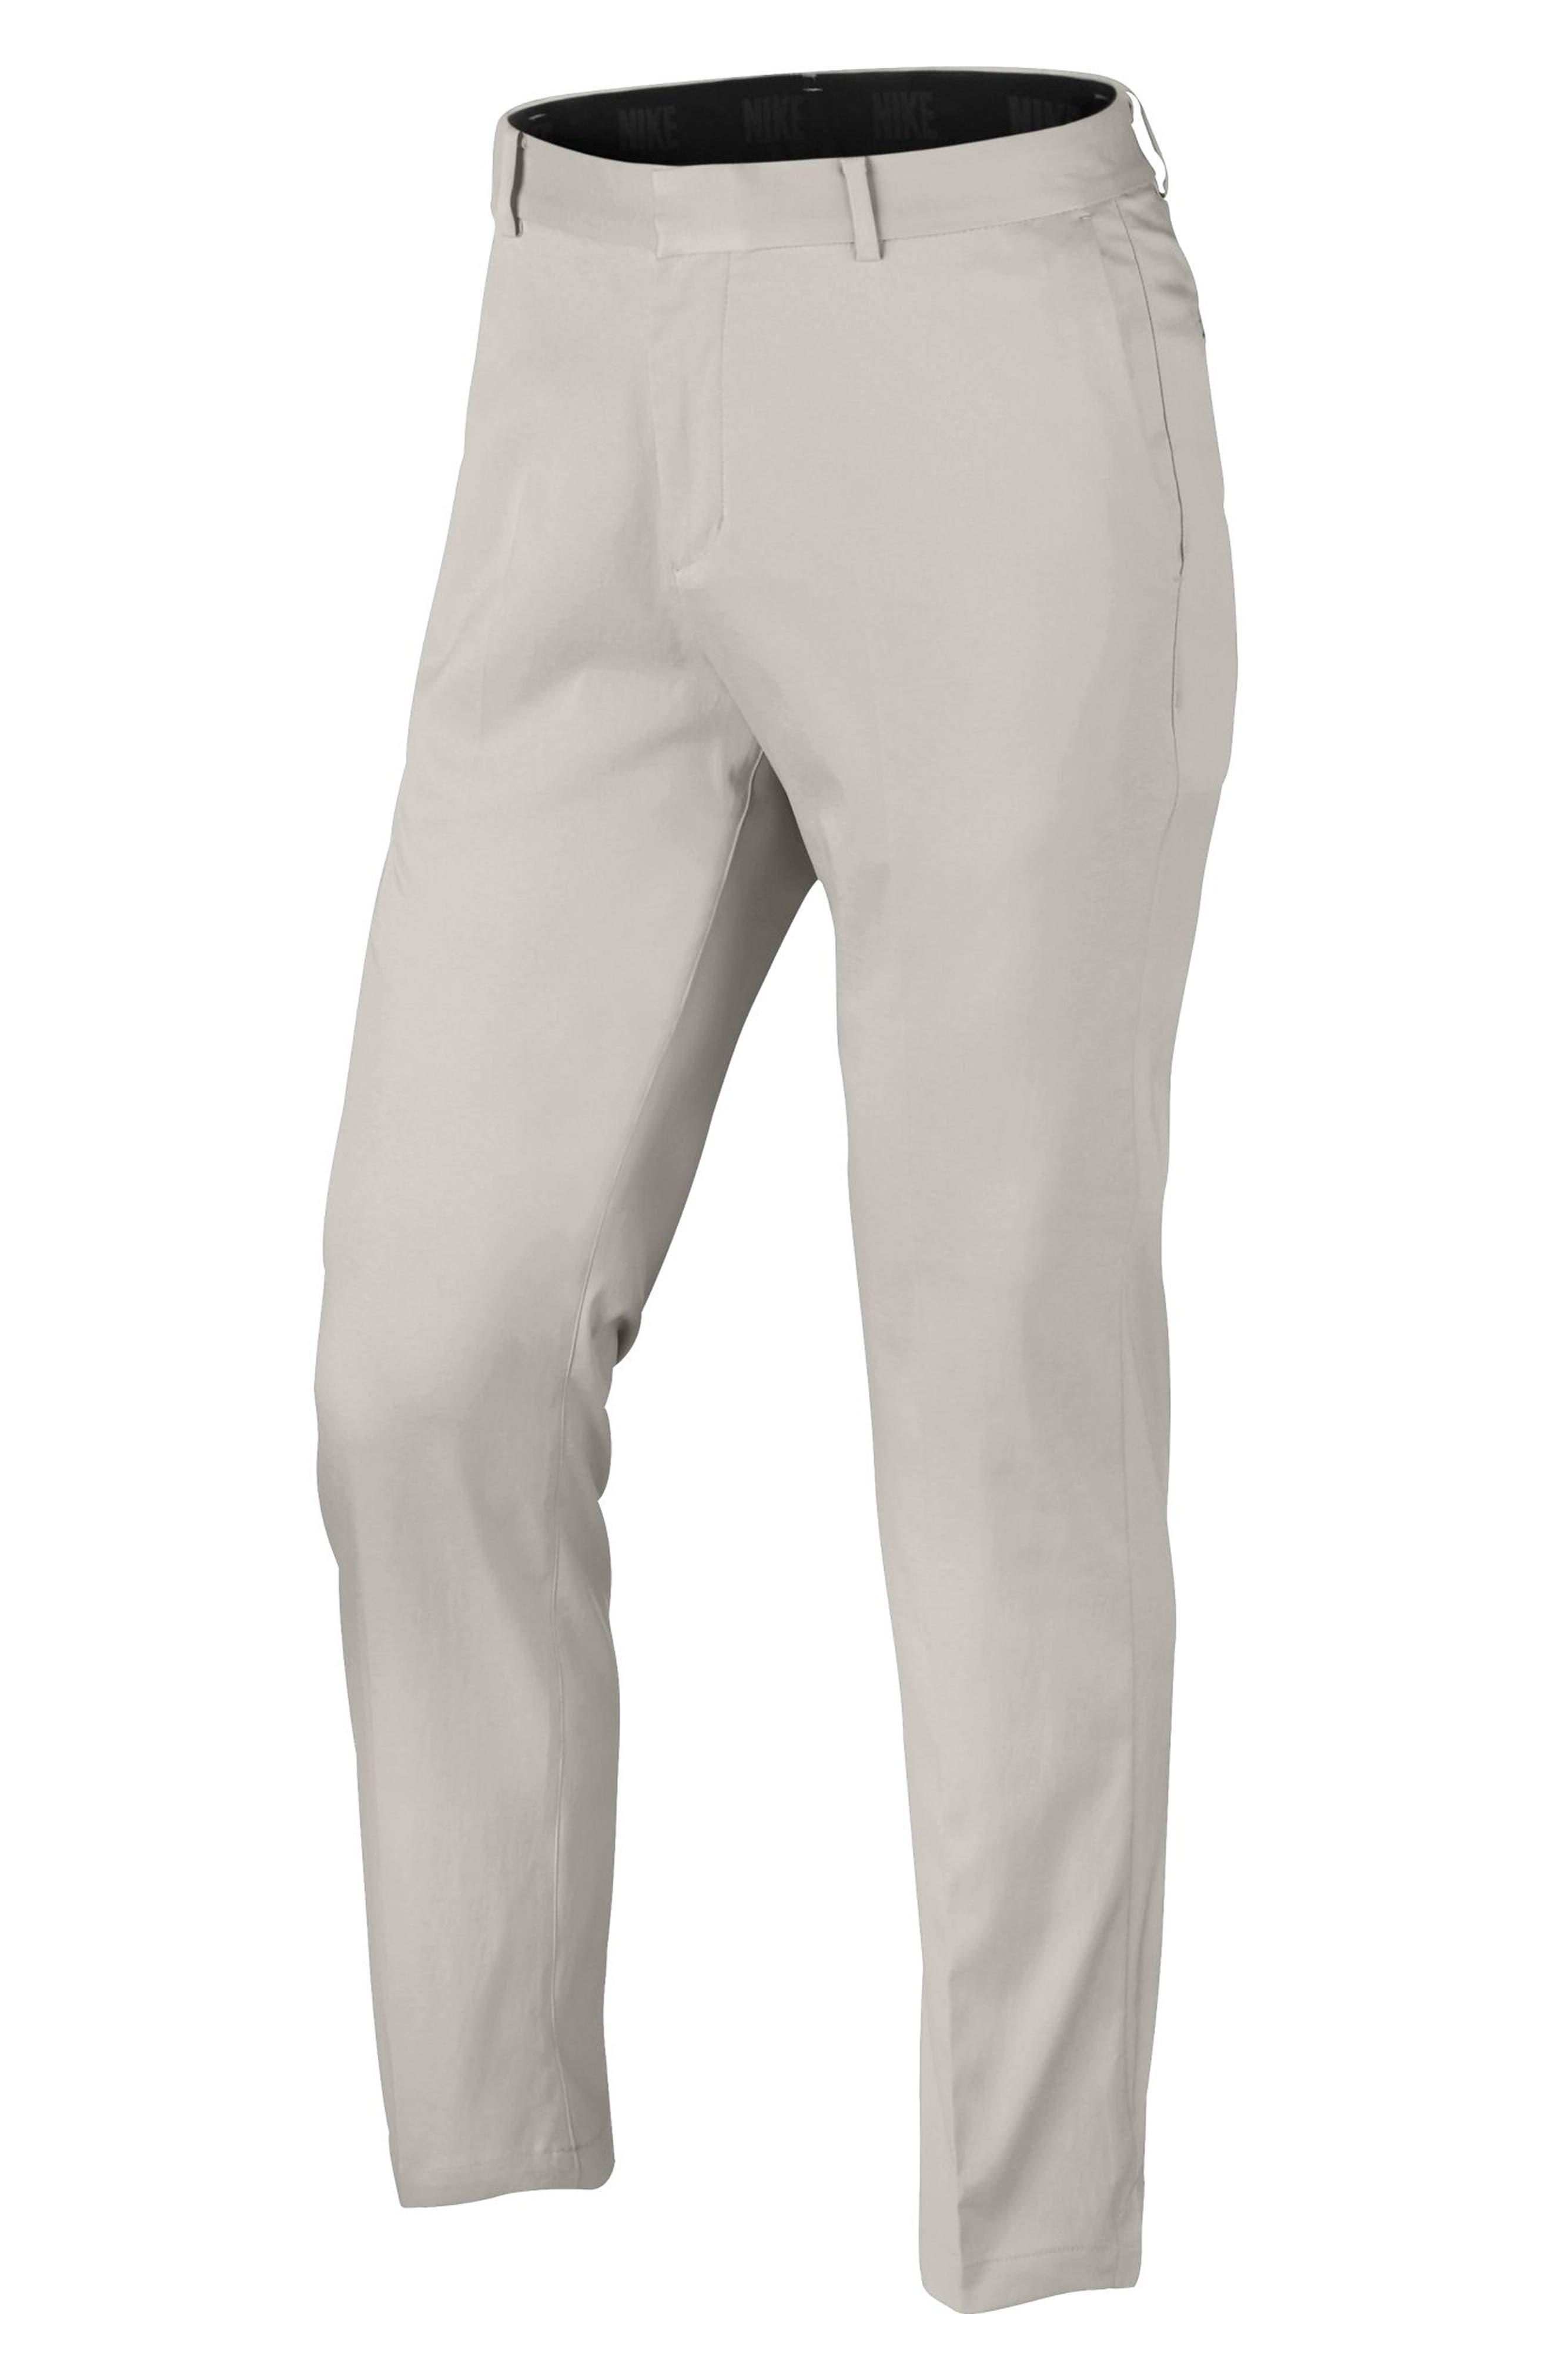 Flat Front Dri-FIT Tech Golf Pants,                             Alternate thumbnail 5, color,                             LIGHT BONE/ LIGHT BONE